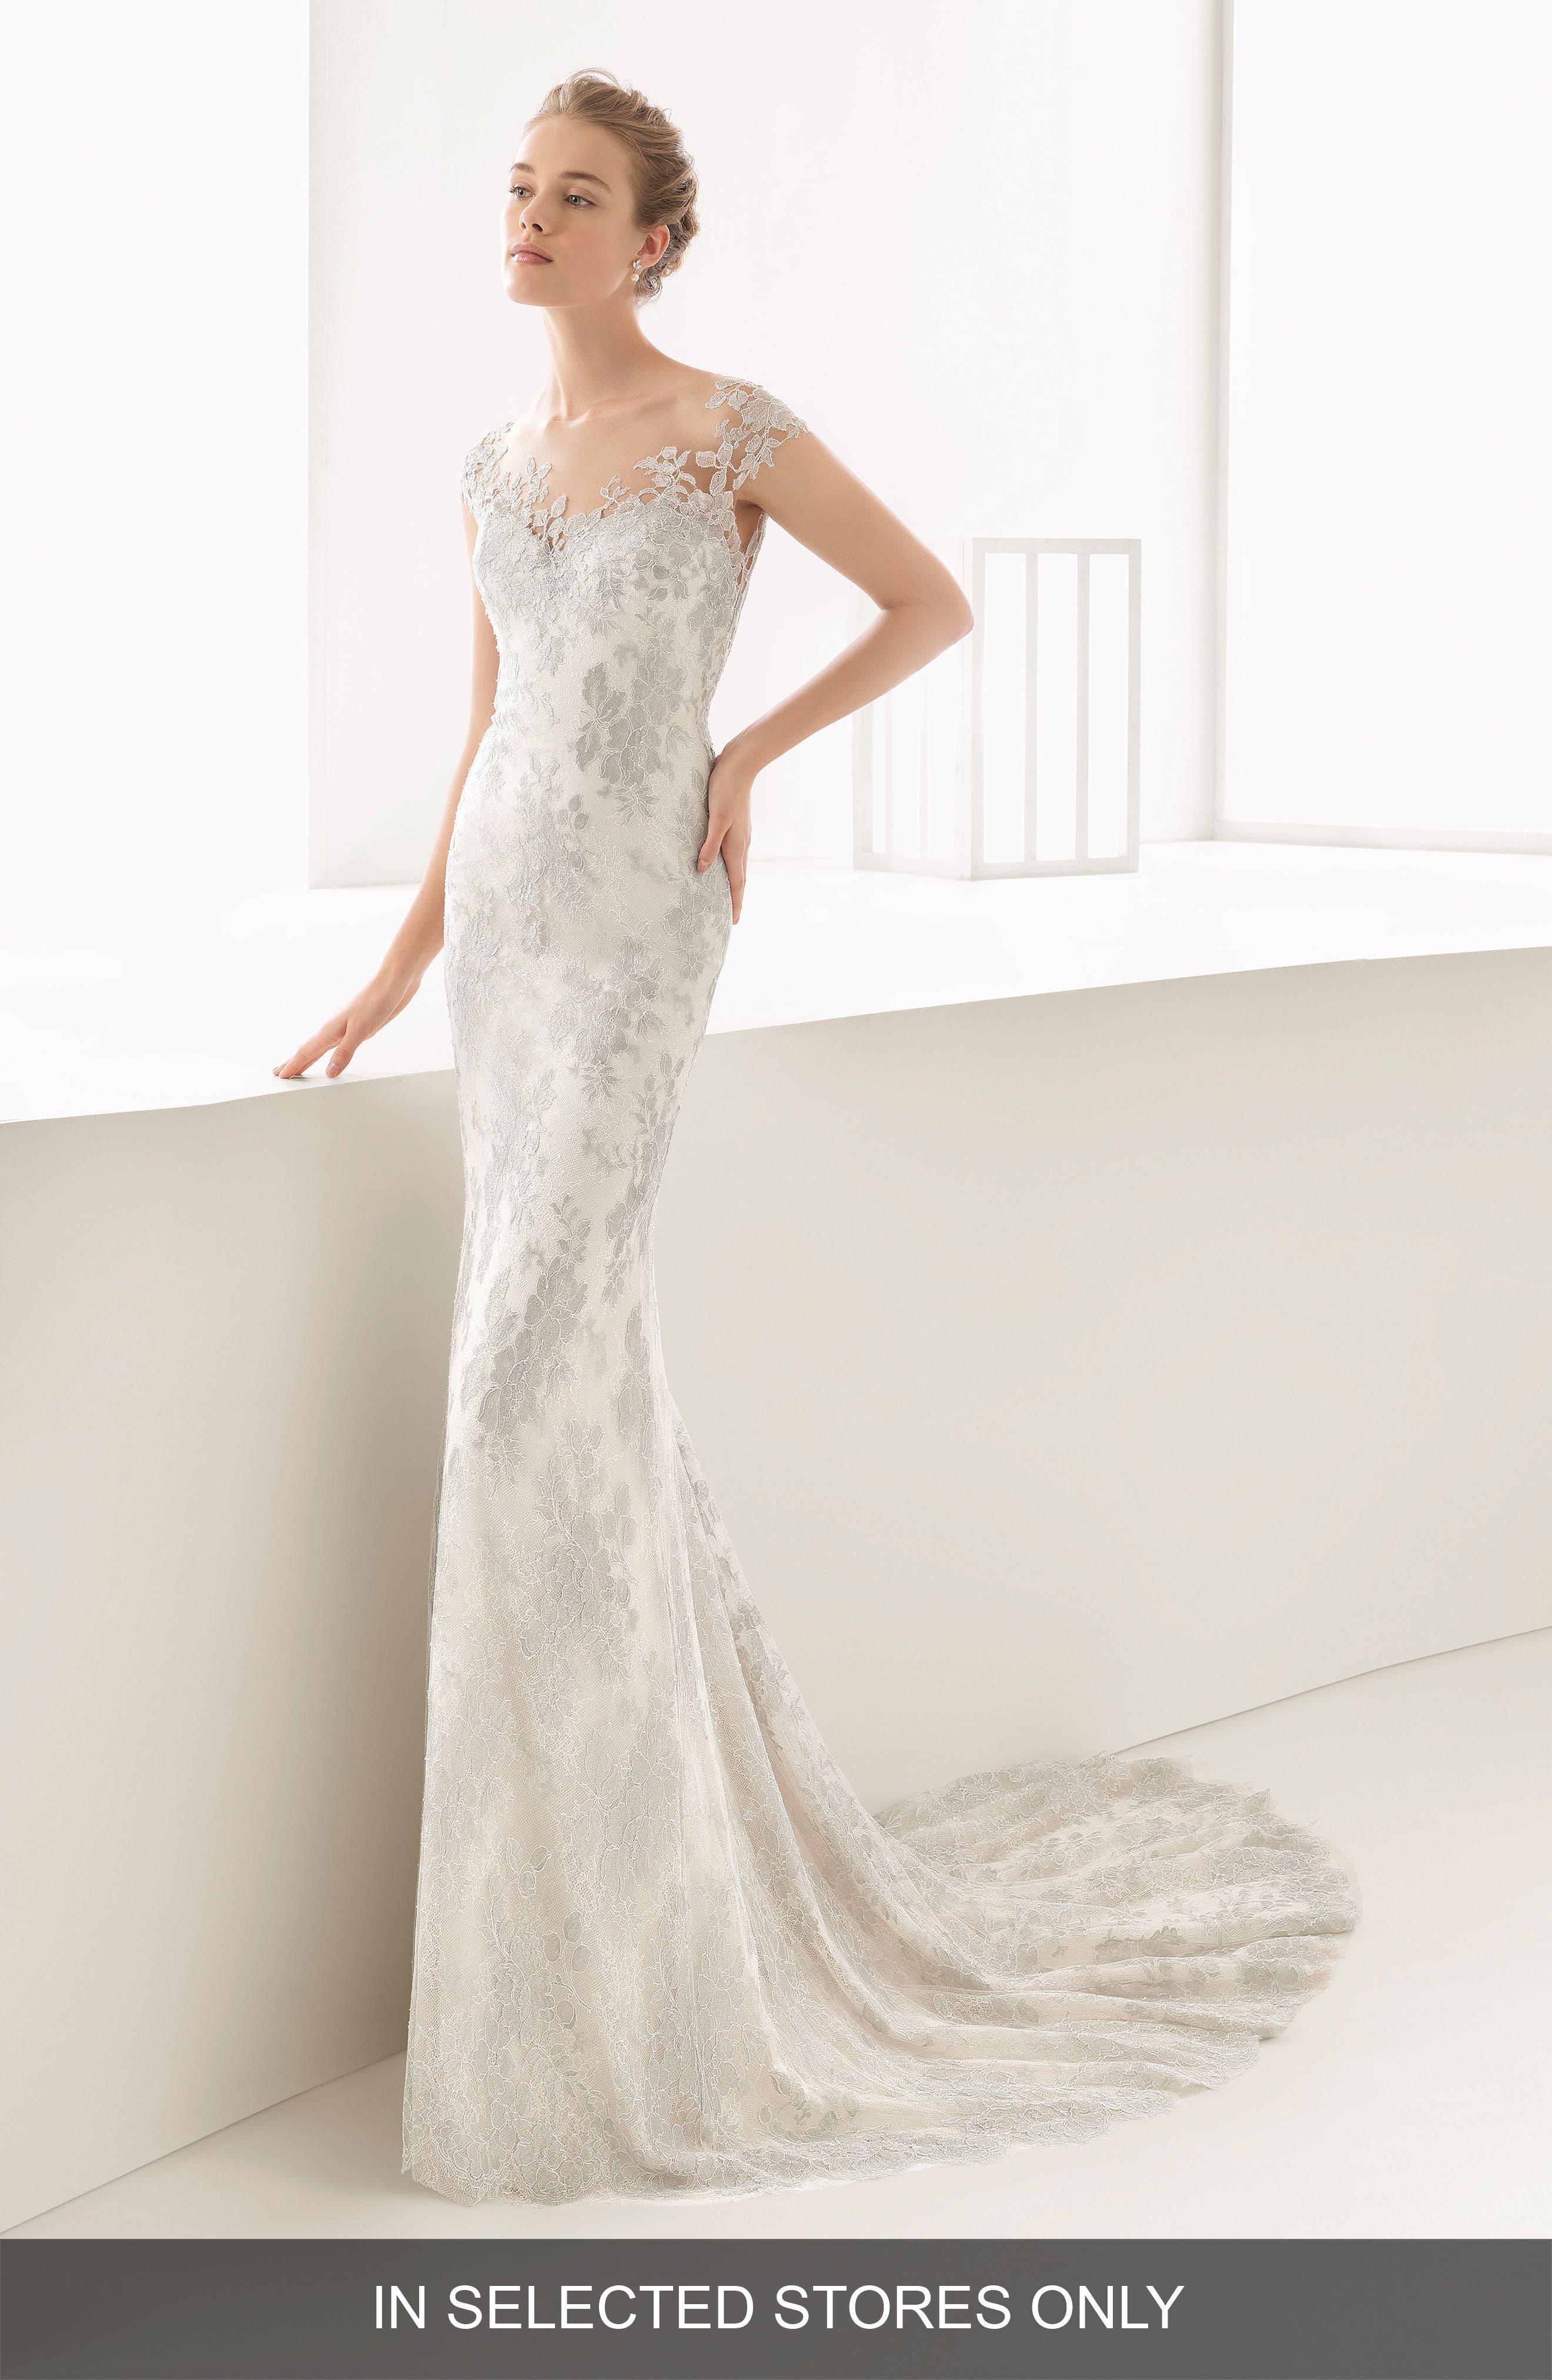 Naia Silver Chantilly Lace Mermaid Gown,                         Main,                         color, Natural